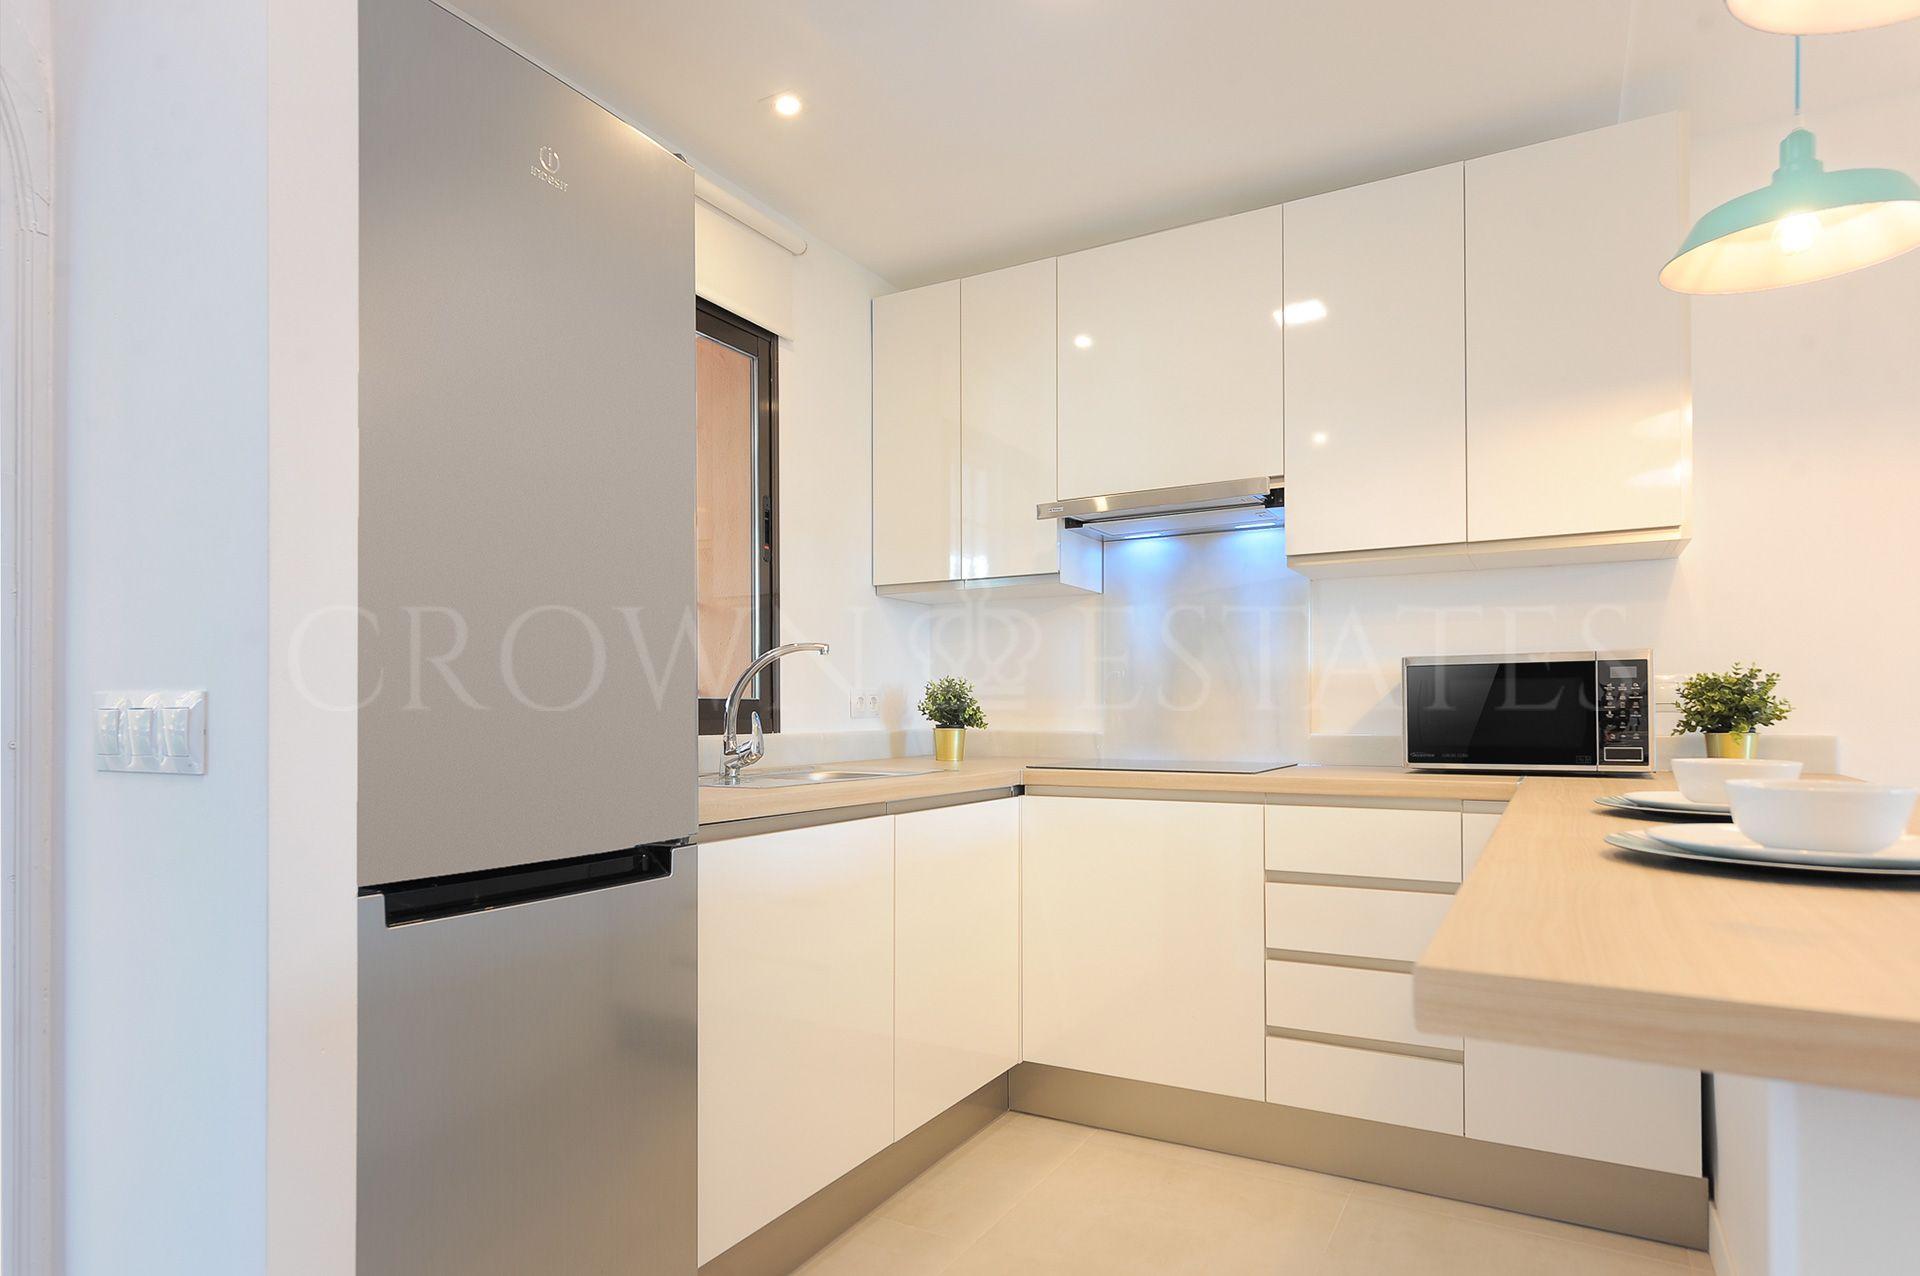 Delta Mar Suites, key-ready apartments near the sea in Mijas Costa